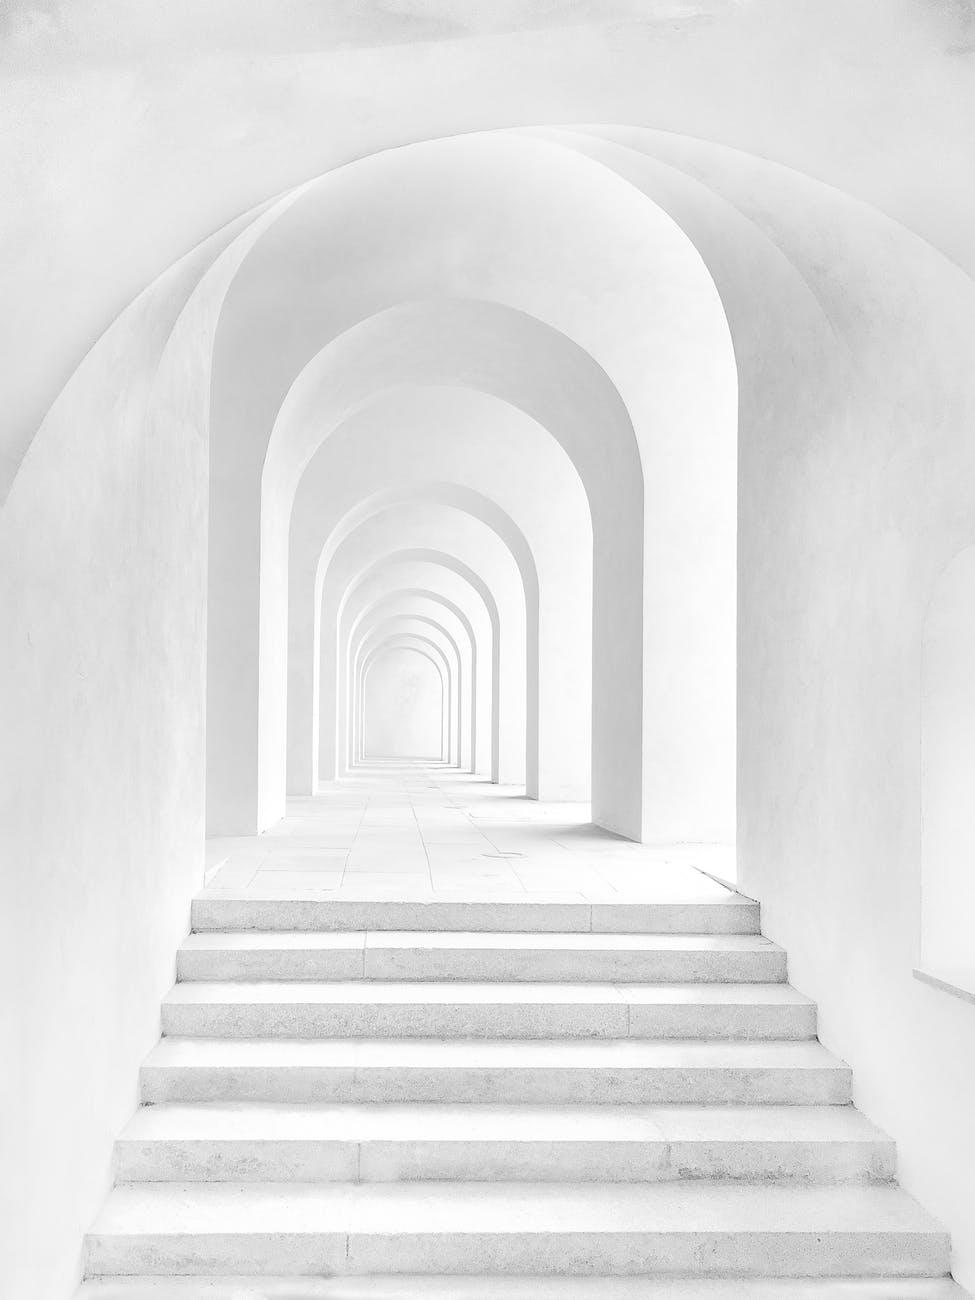 arches hallway inside building